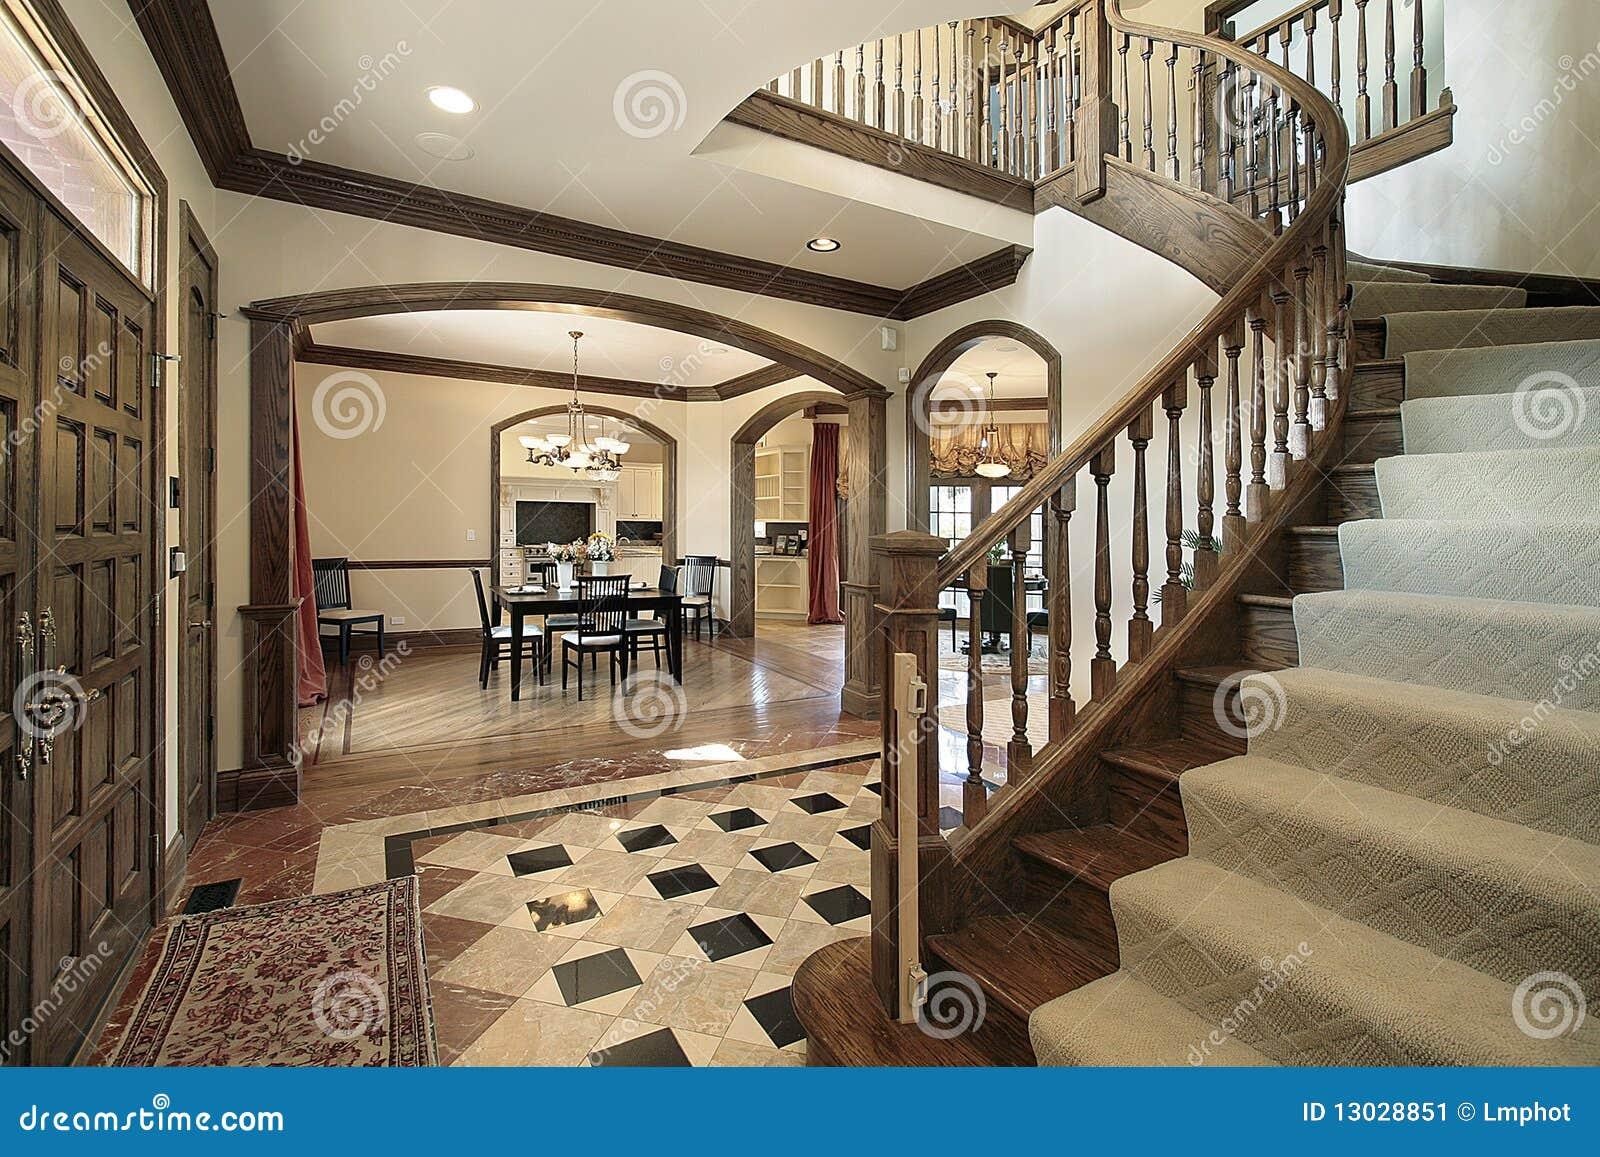 Foyer with floor design stock image image 13028851 for Luxury foyer design